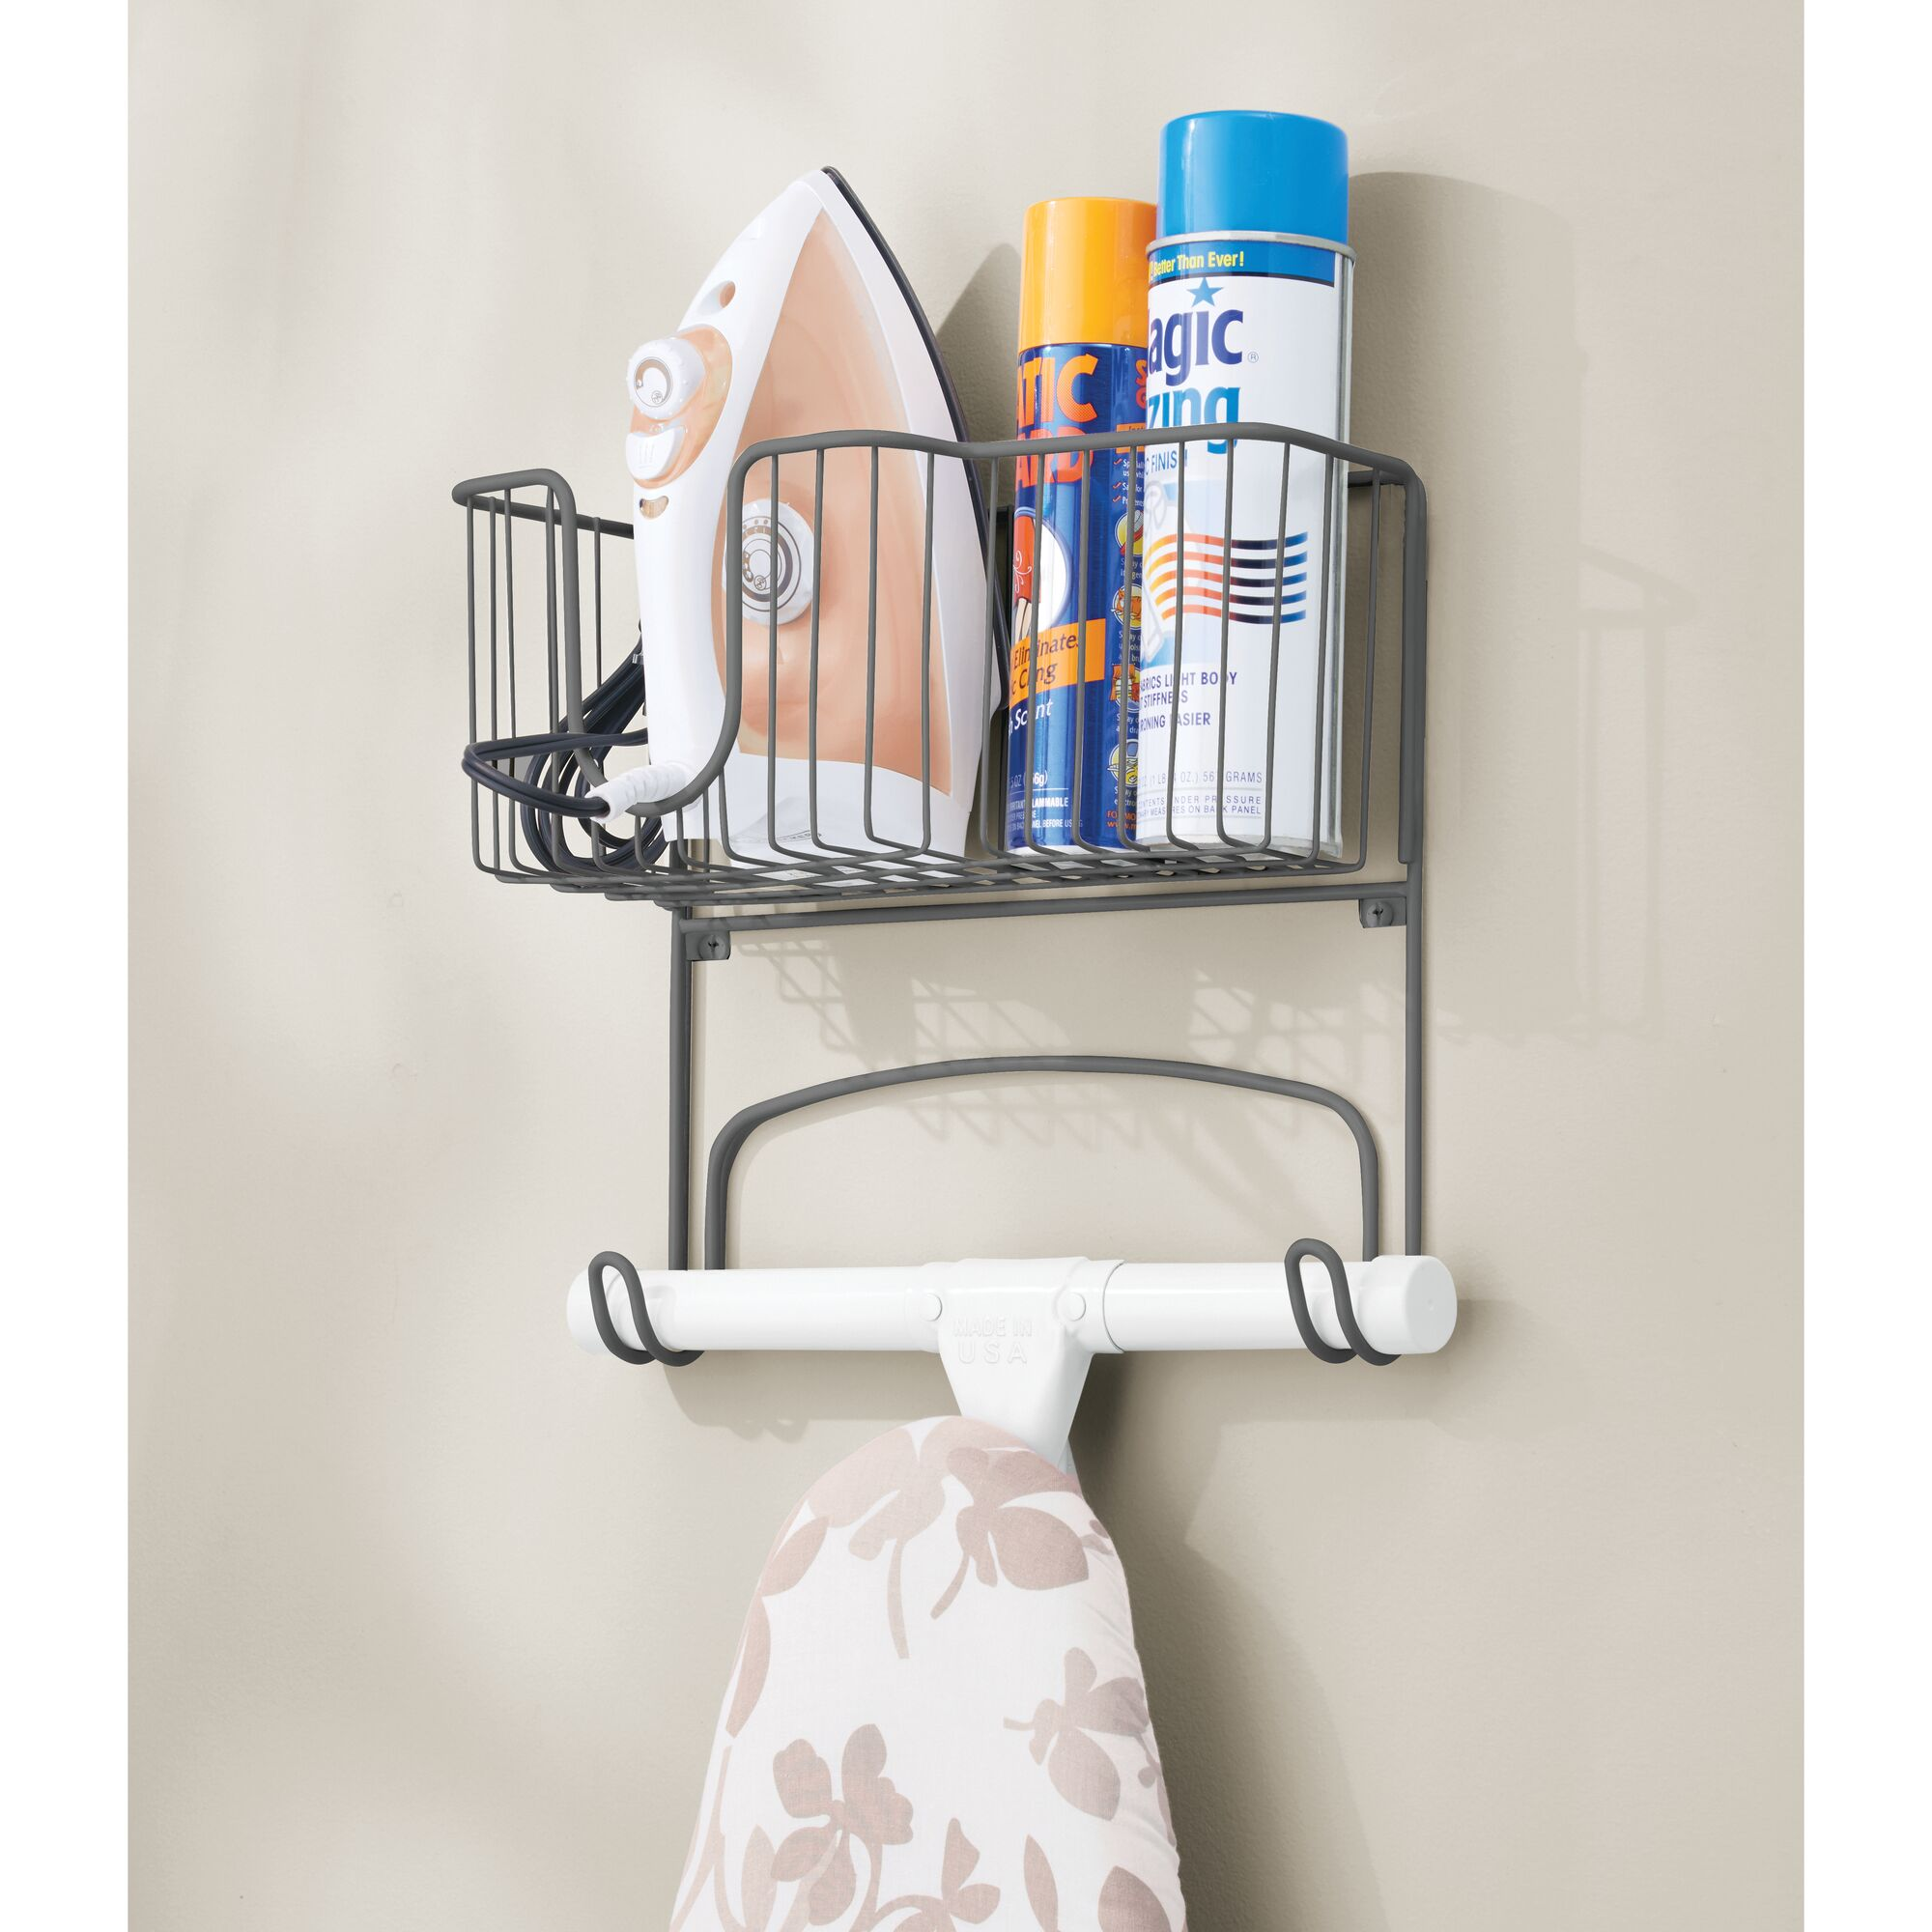 mDesign-Wall-Mount-Ironing-Board-Holder-Large-Storage-Basket thumbnail 31